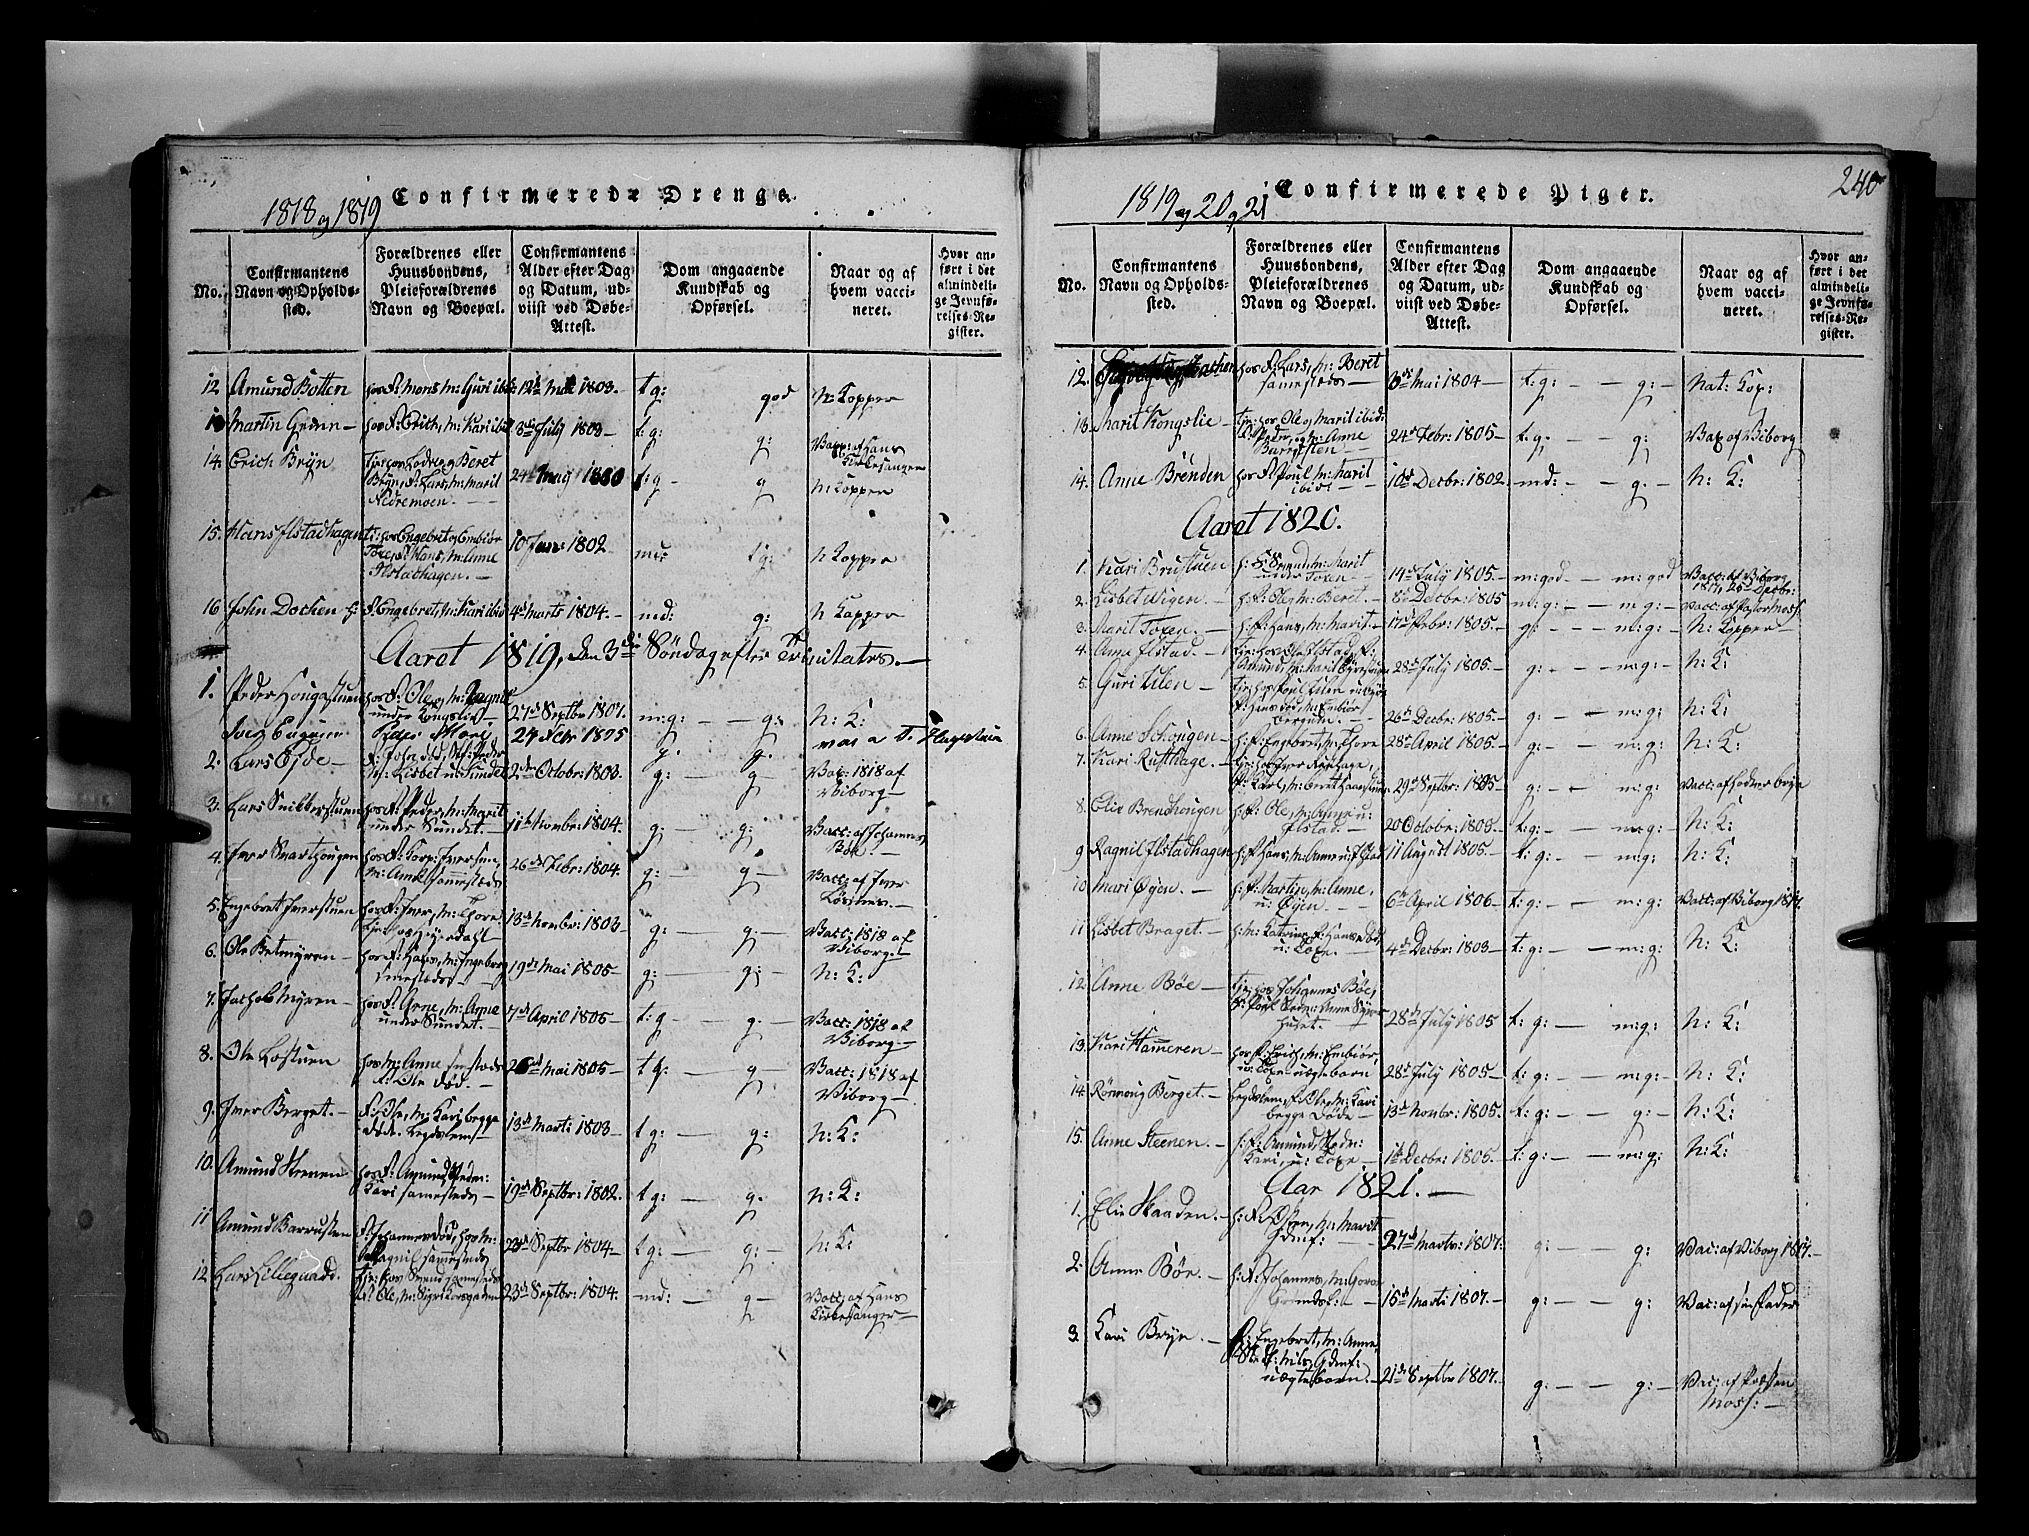 SAH, Fron prestekontor, H/Ha/Hab/L0004: Klokkerbok nr. 4, 1816-1850, s. 240